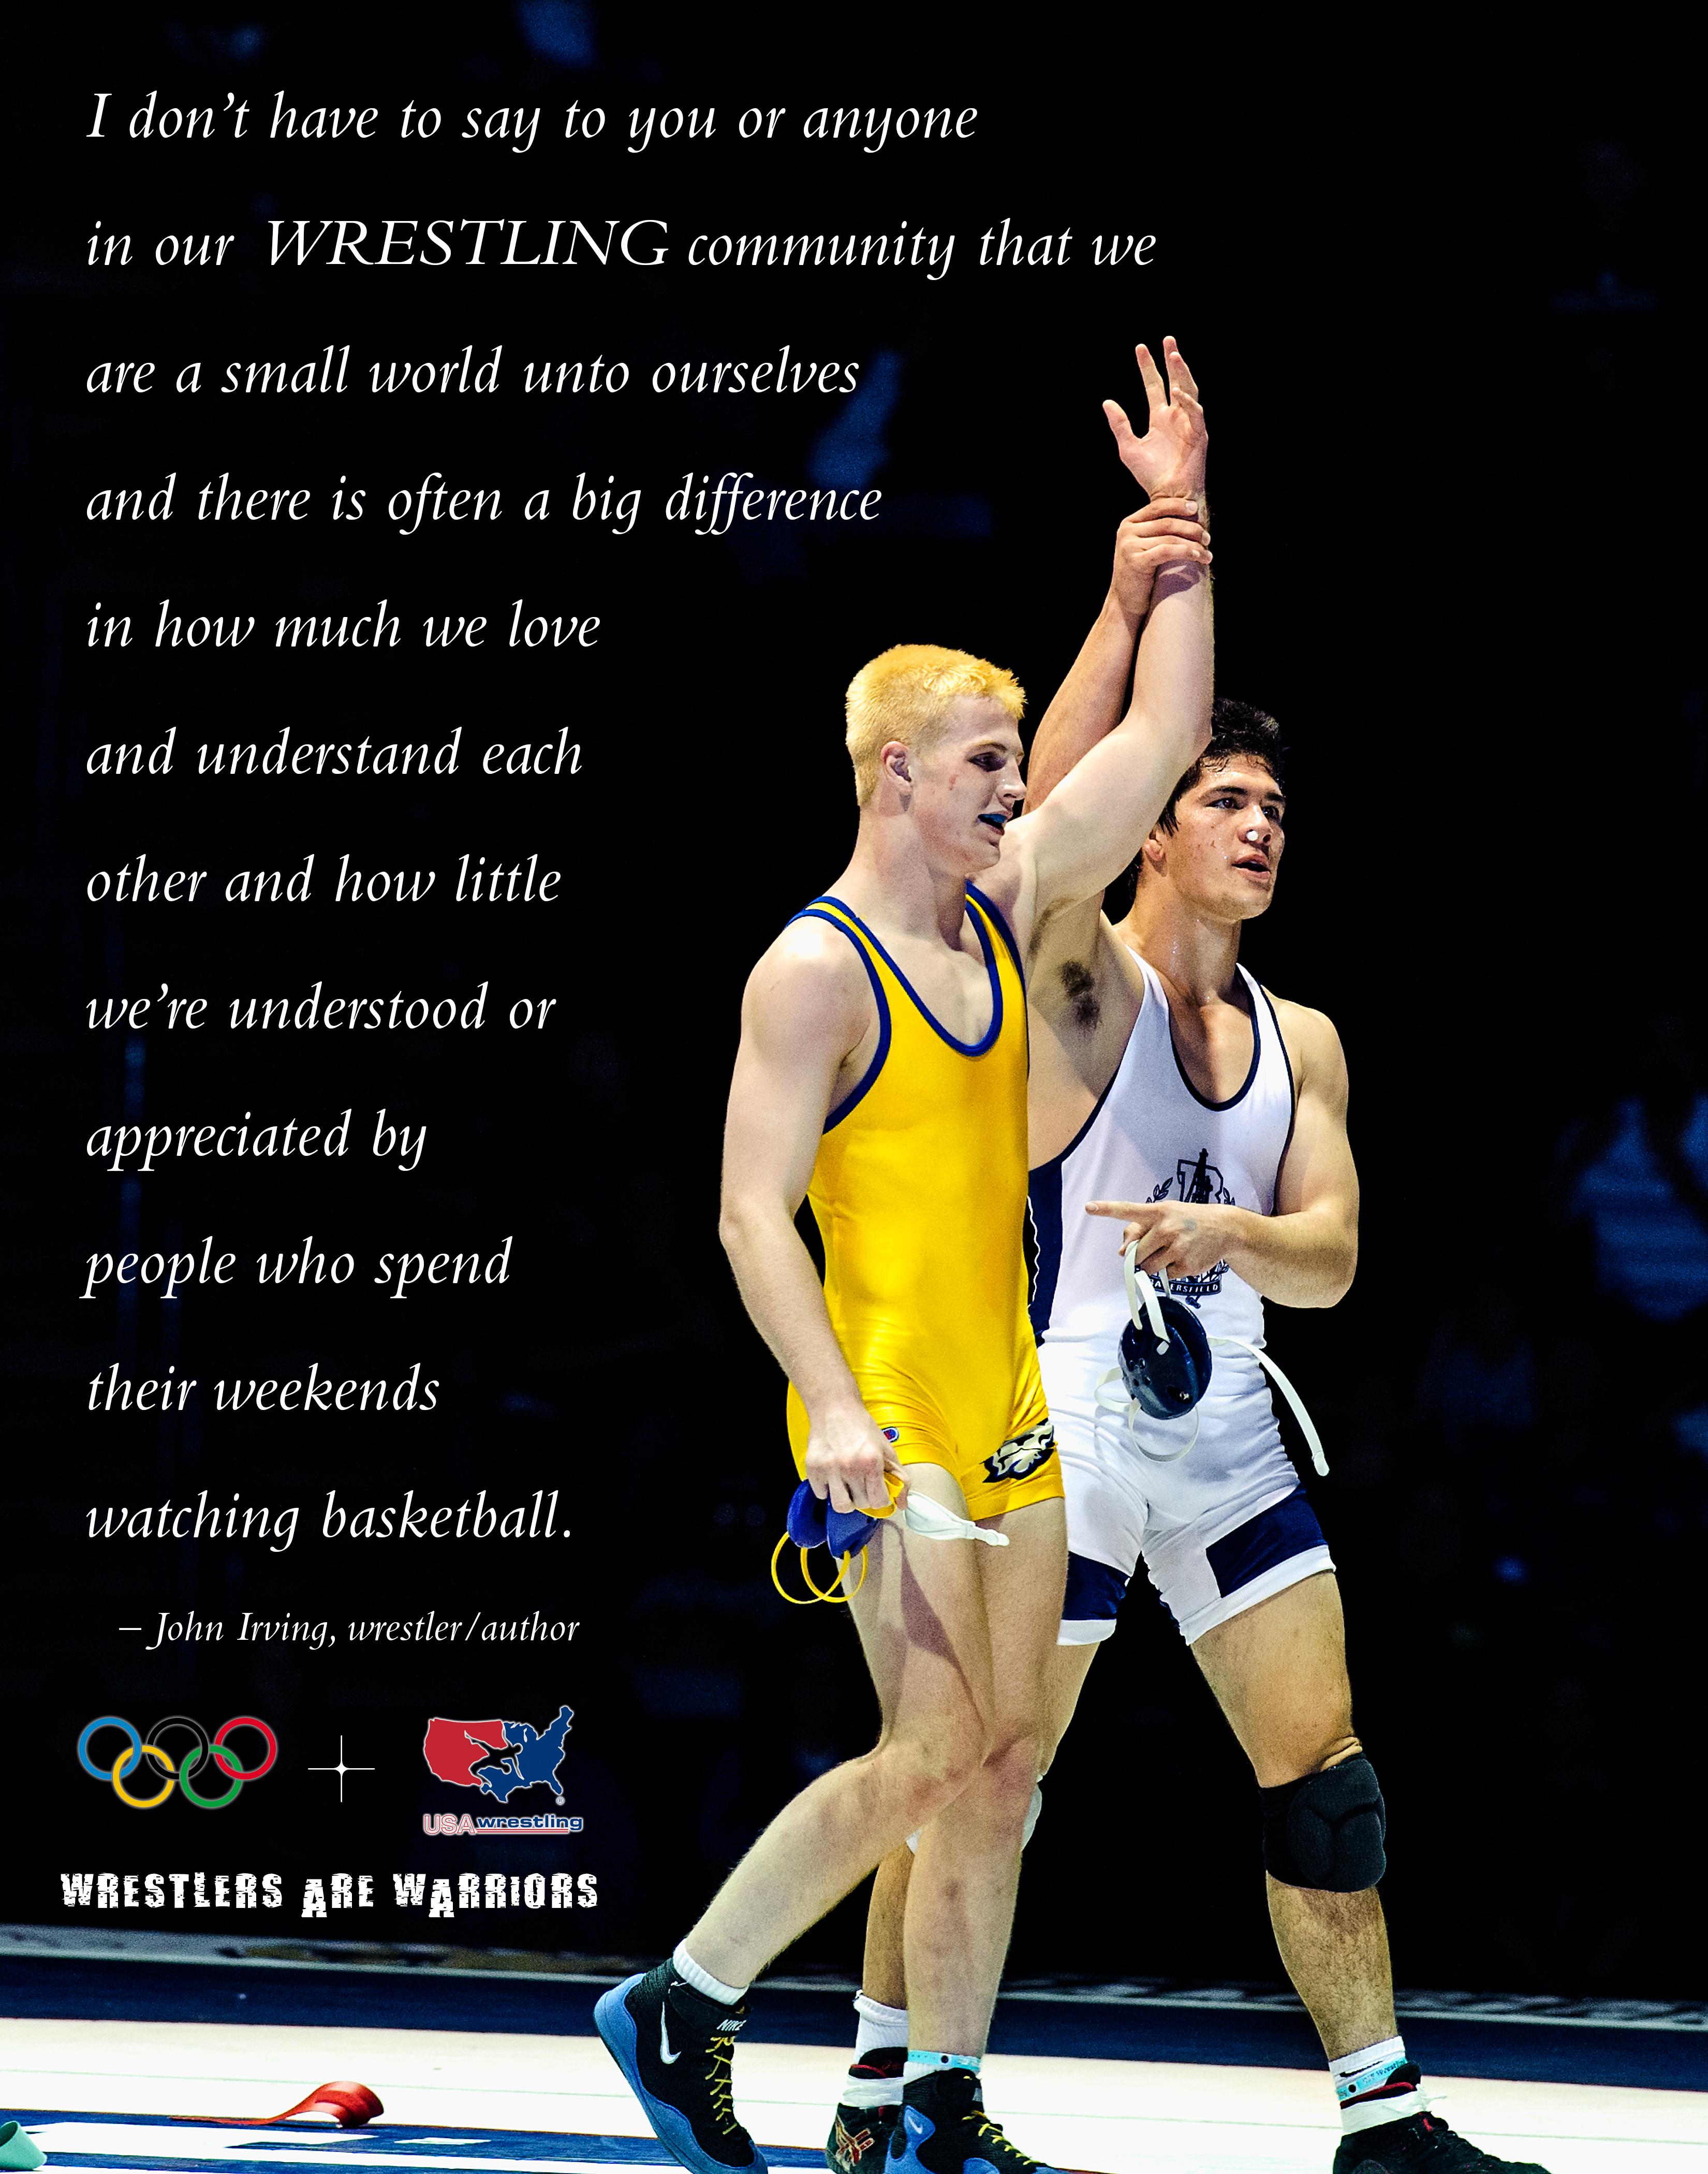 John Irving's quote #1